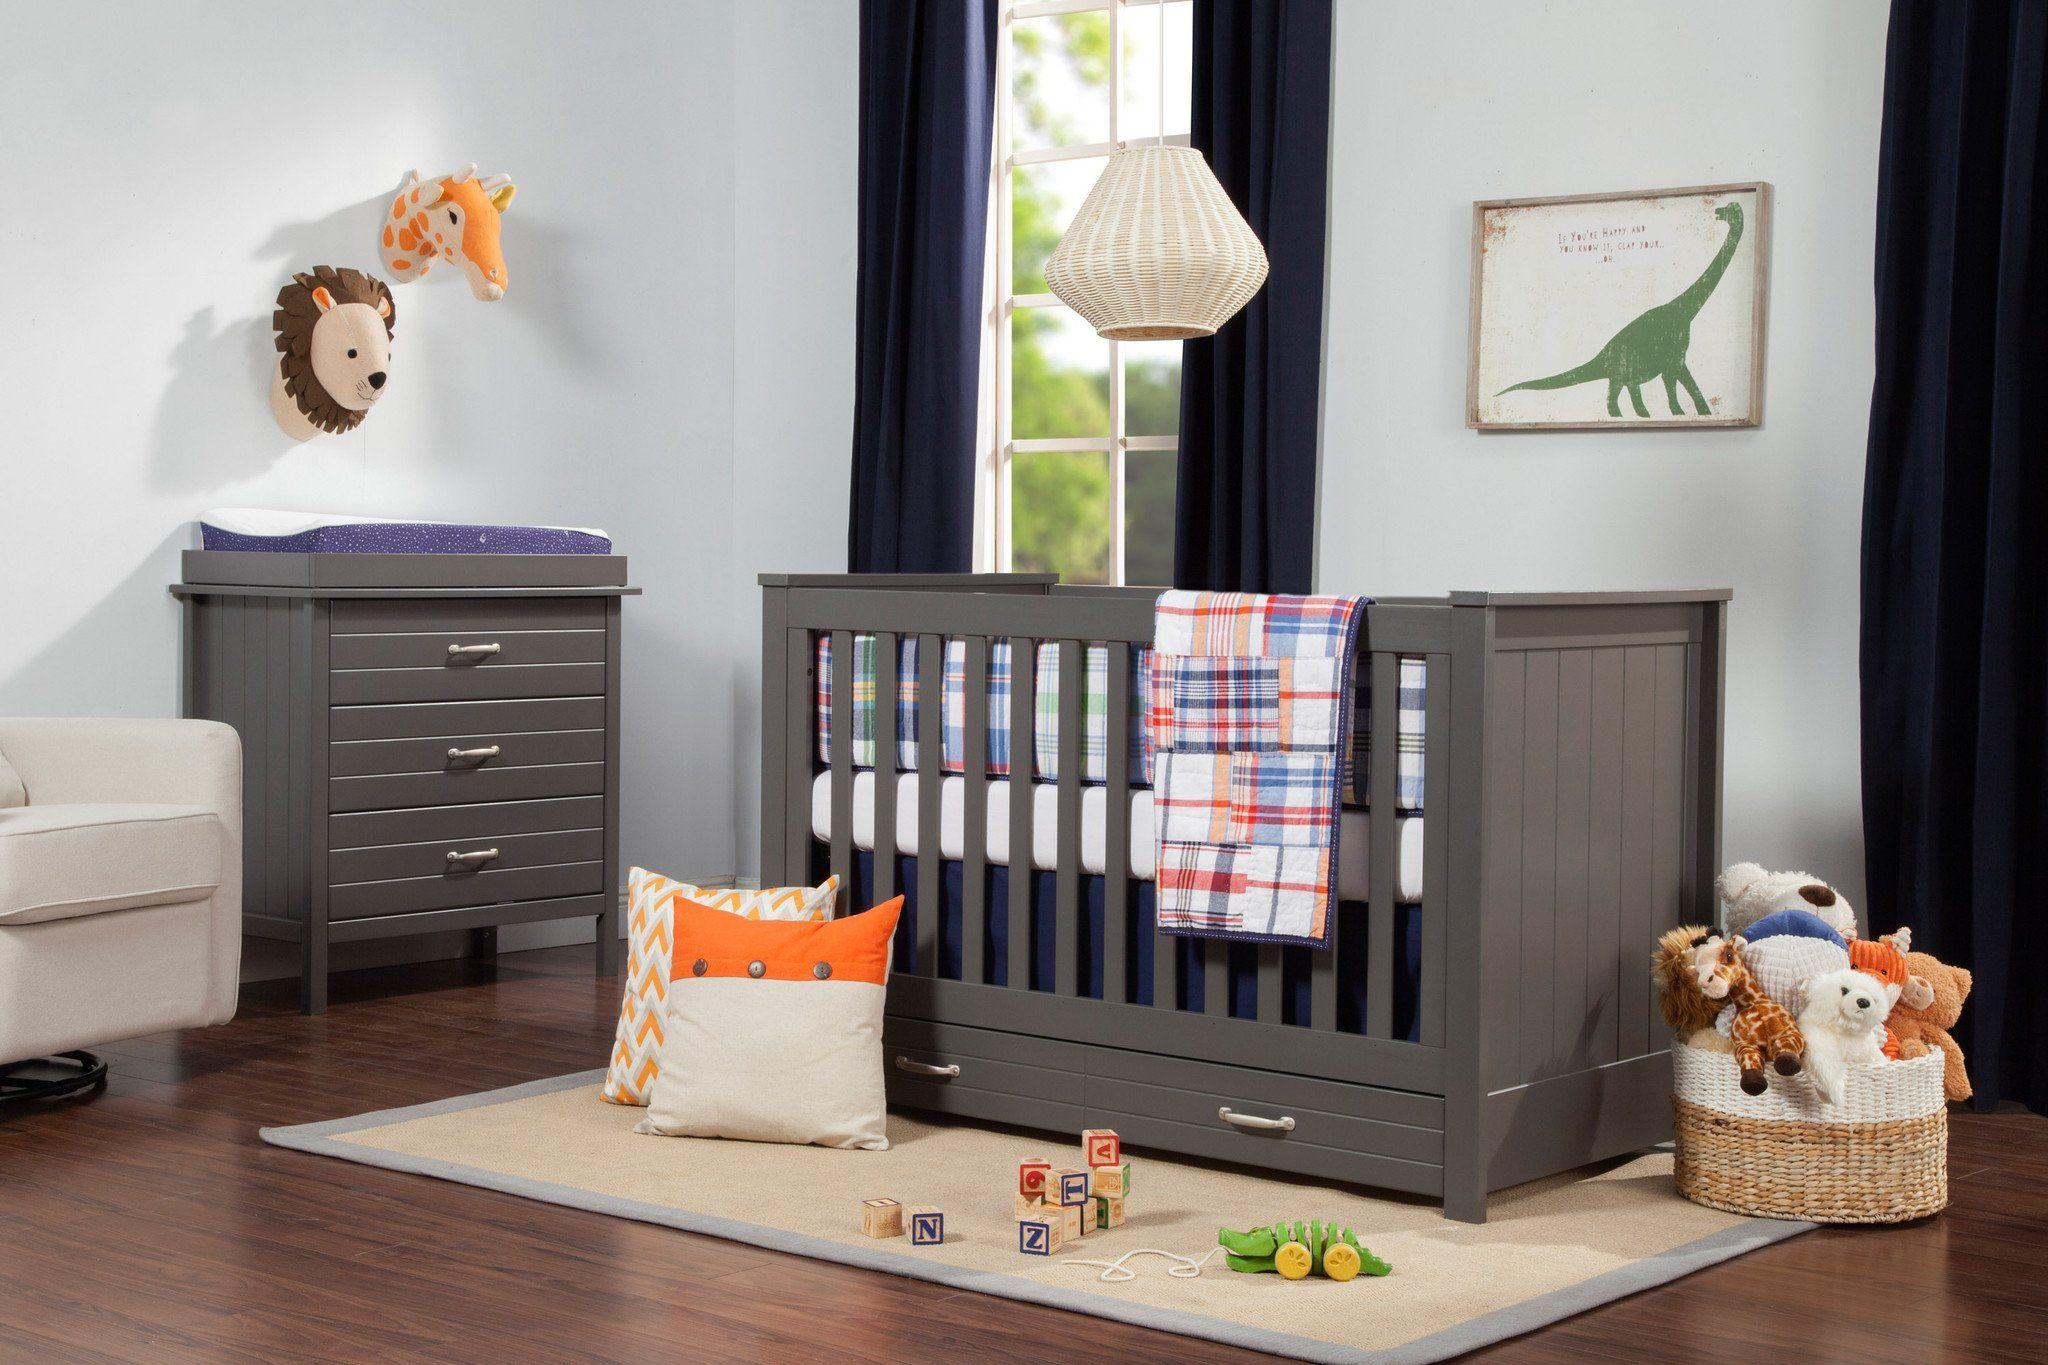 Everton 3 In 1 Toddler Bed Conversion Kit Toddler Bed Bed